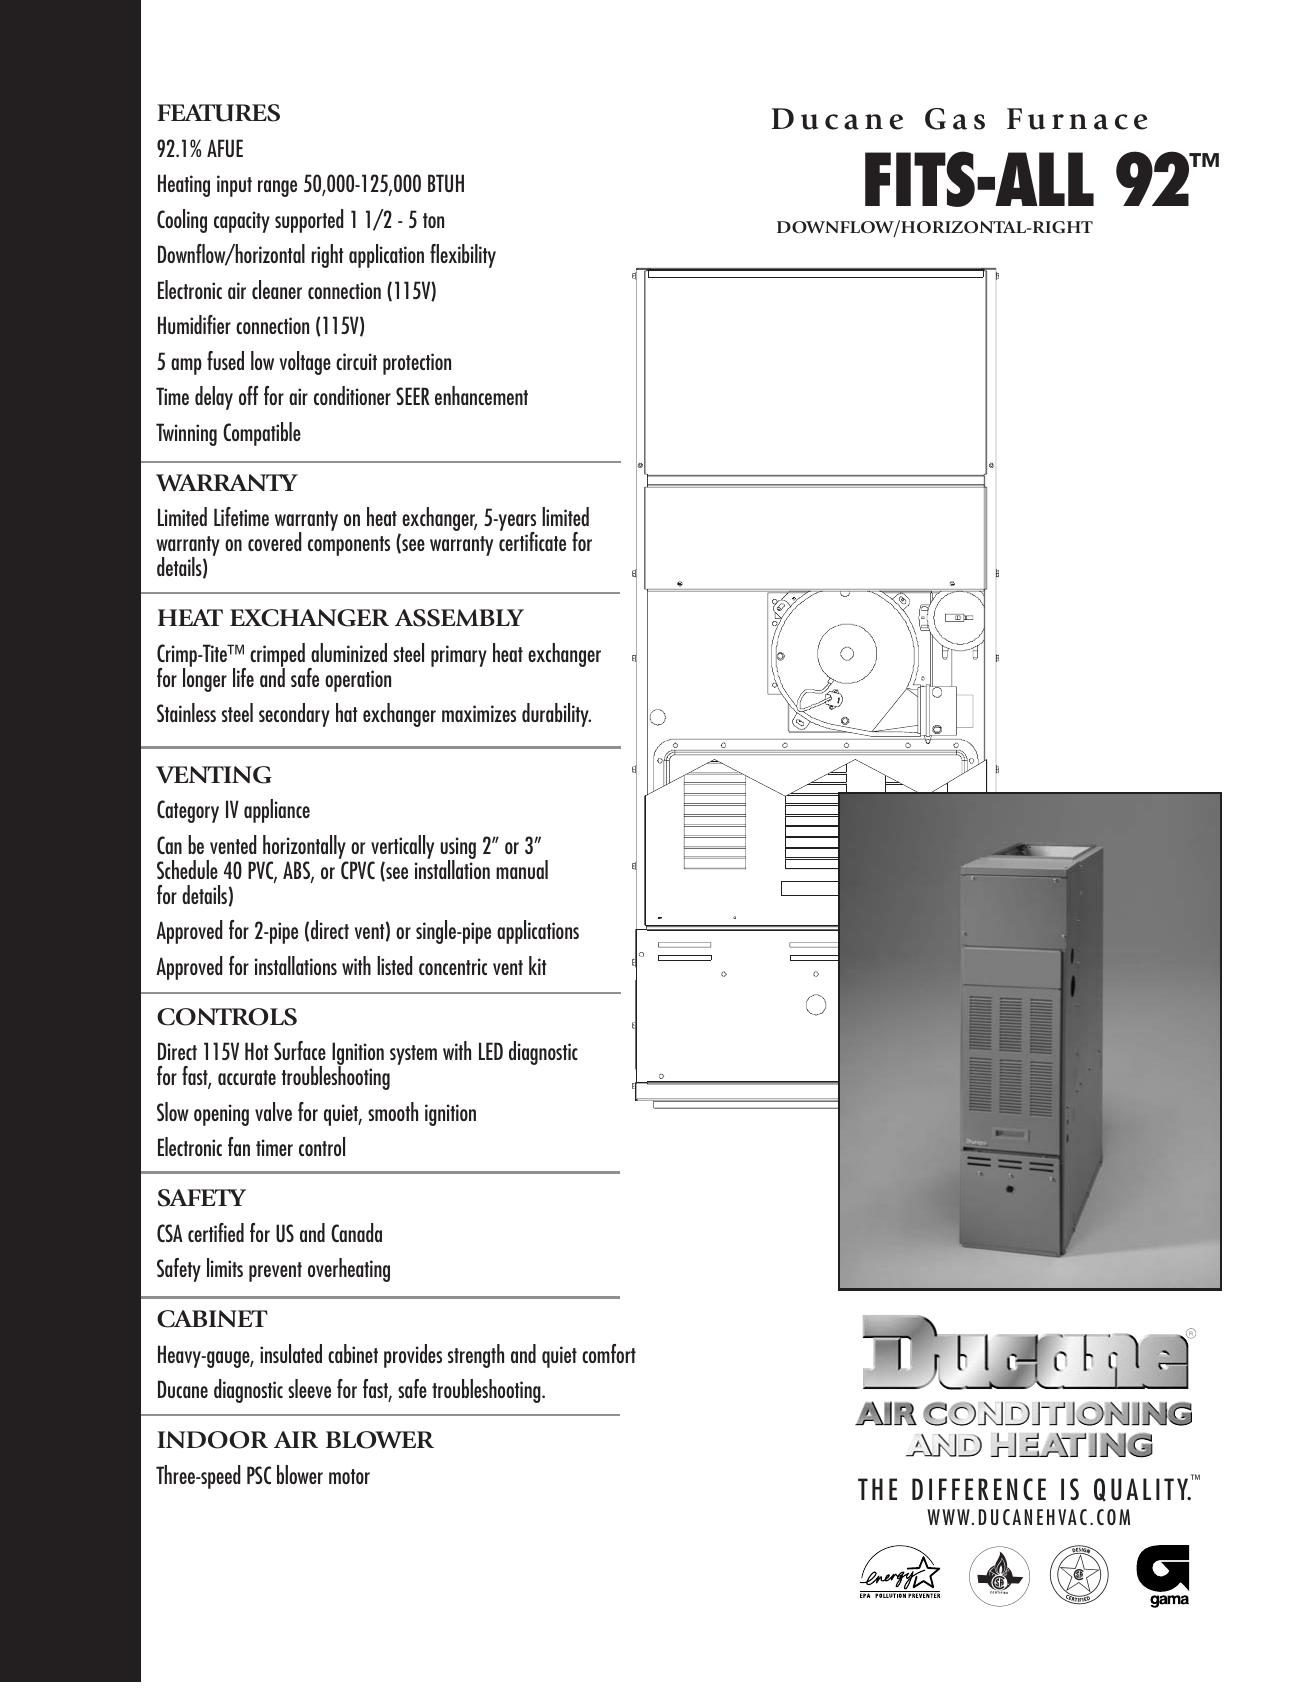 Ducane Furnace Fits All 92 User Manual Manualzz